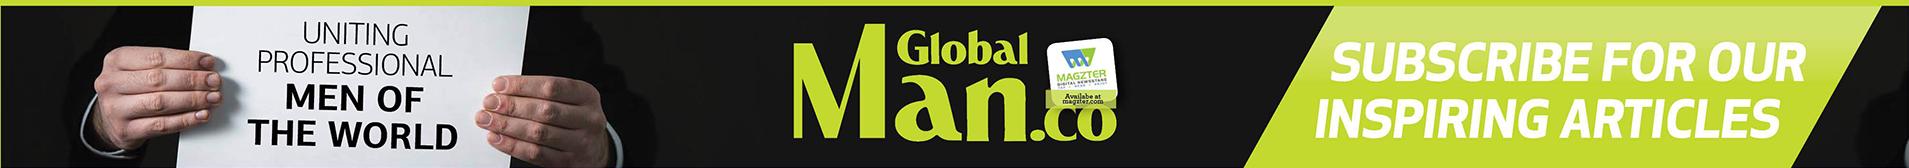 Global man